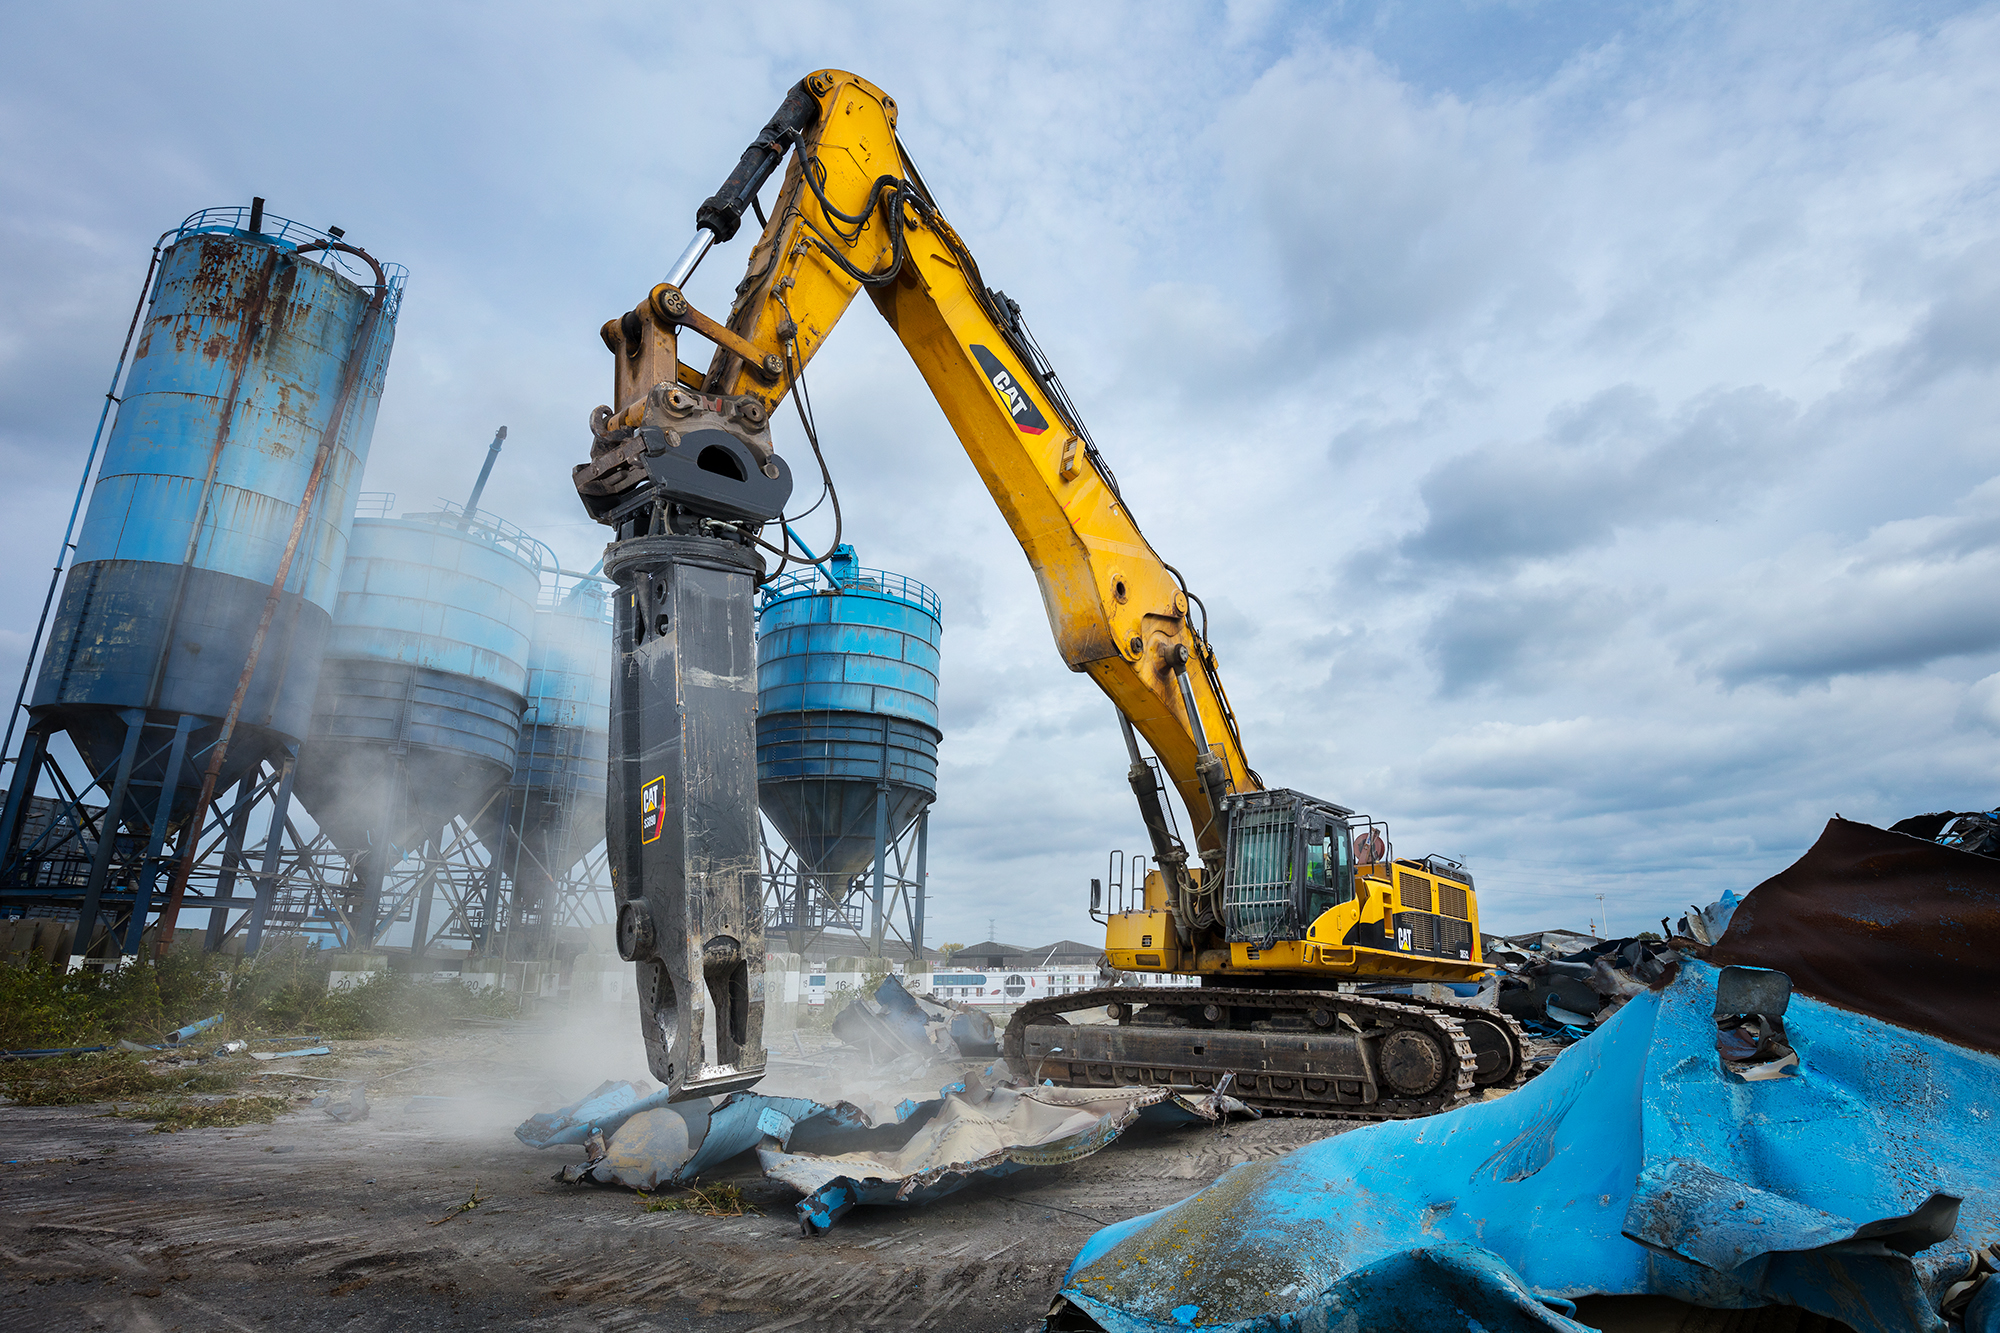 SPUISERS Caterpillar Shear S9030 demolition vanlommel gent